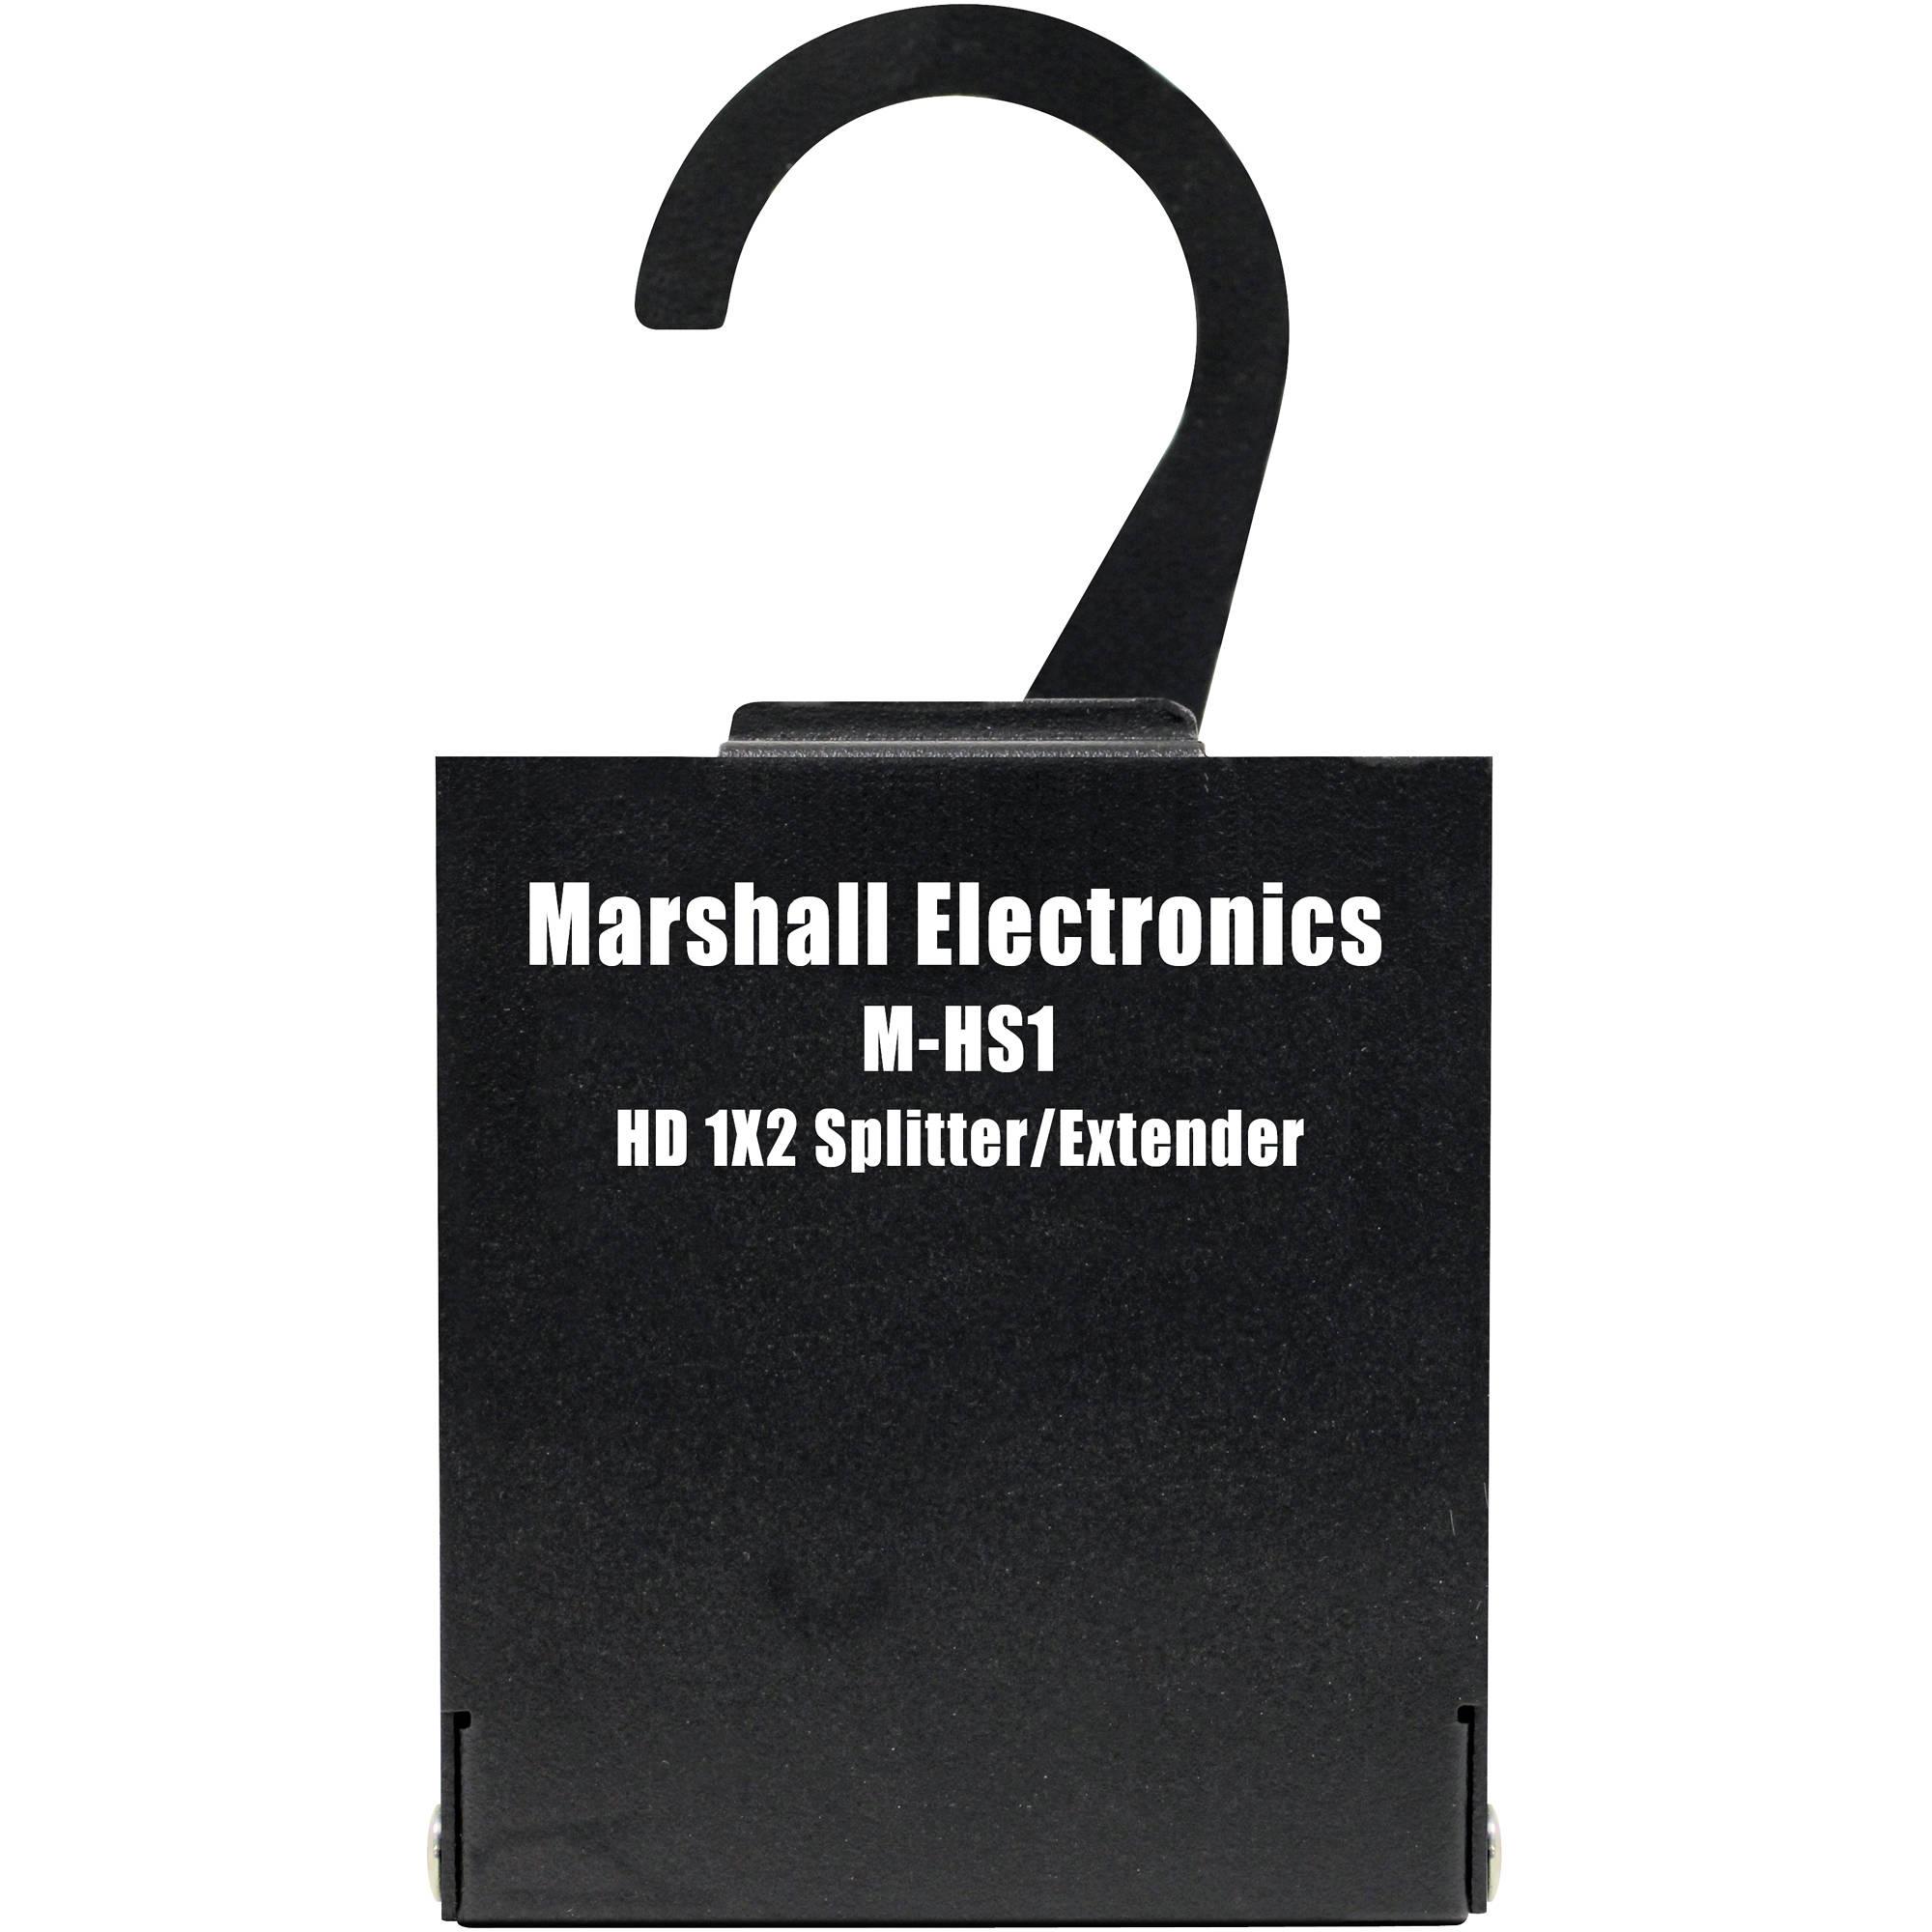 M Bel Marshall marshall electronics m hs1 hdmi 1x2 splitter extender m hs1